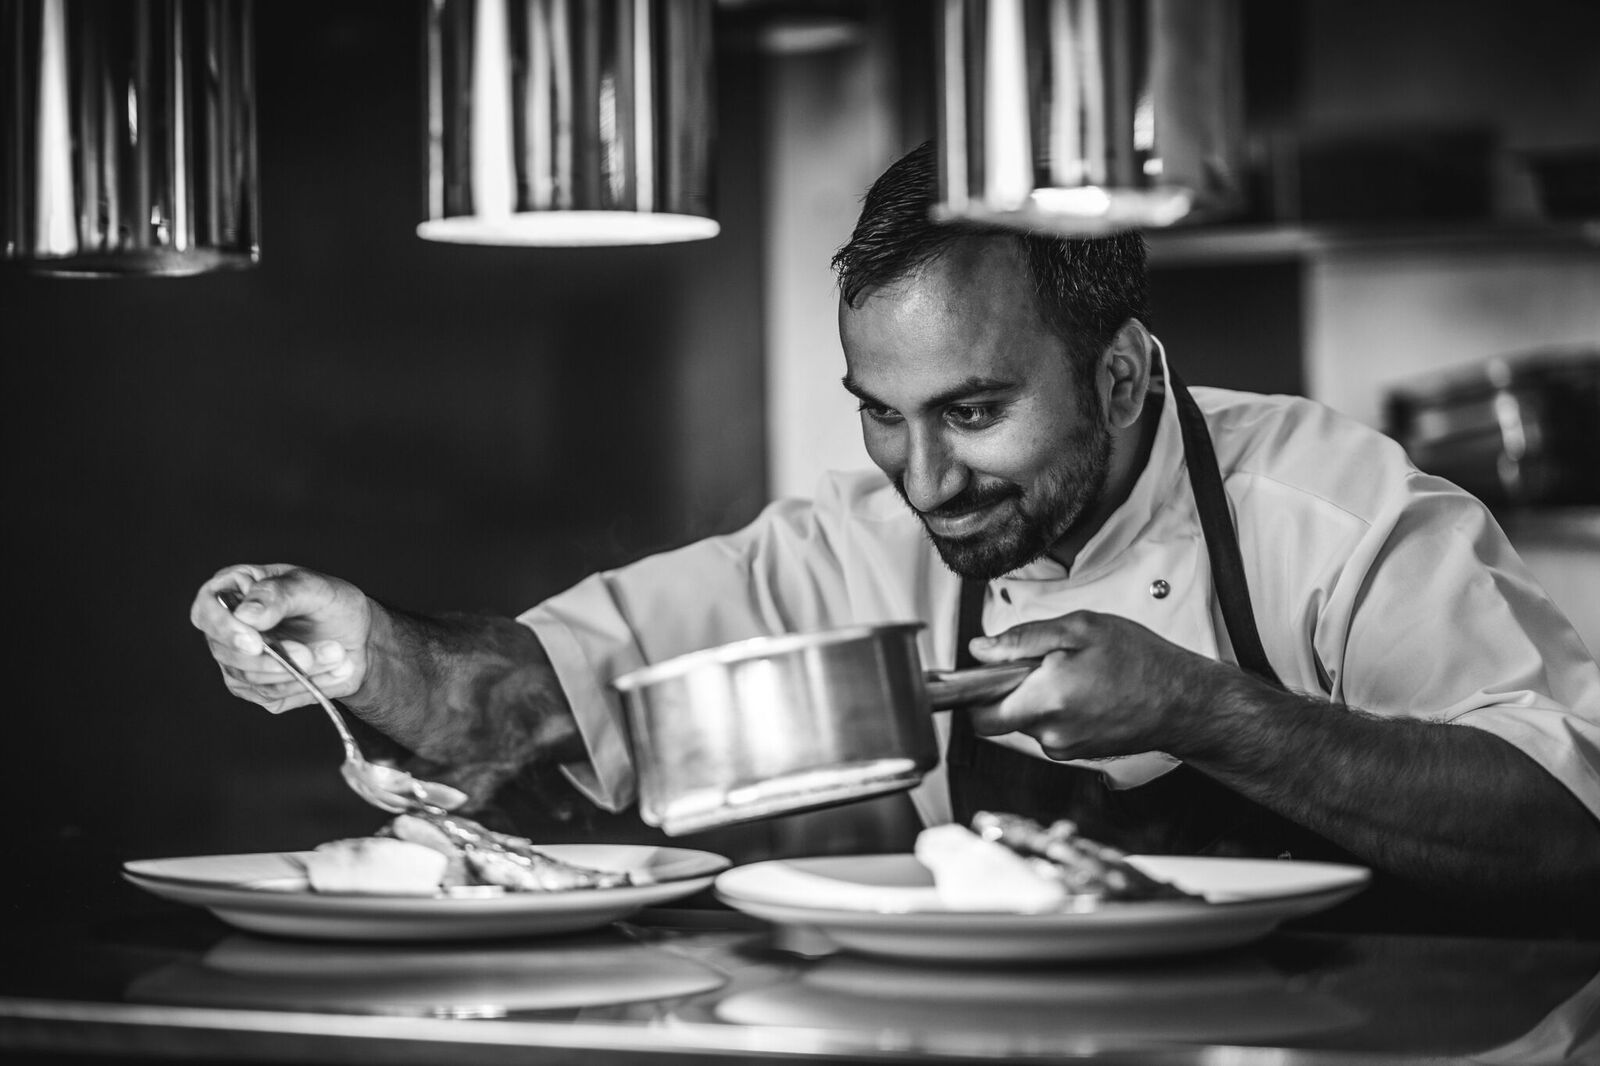 FRENCH DINING WEEK 2018 MENU-italienske restaurant Falkoner Alle frderiksberg